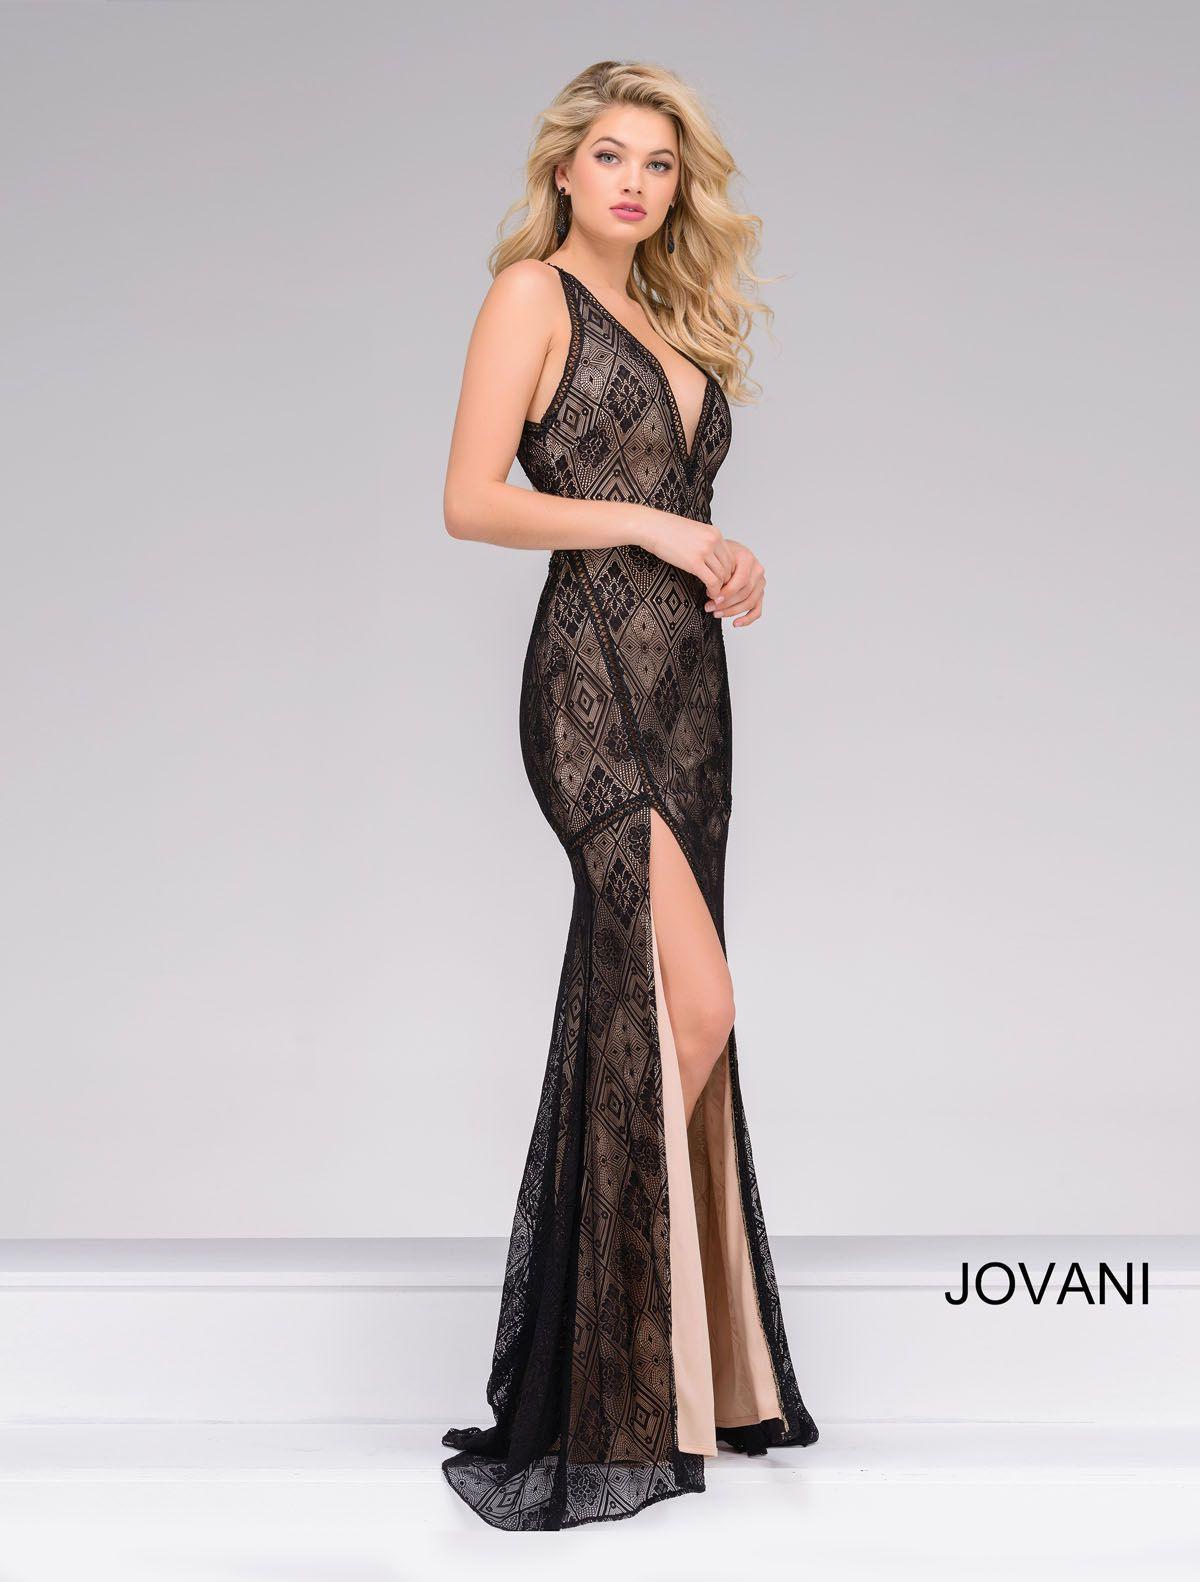 Jovani jovani prom dresses pinterest prom dresses